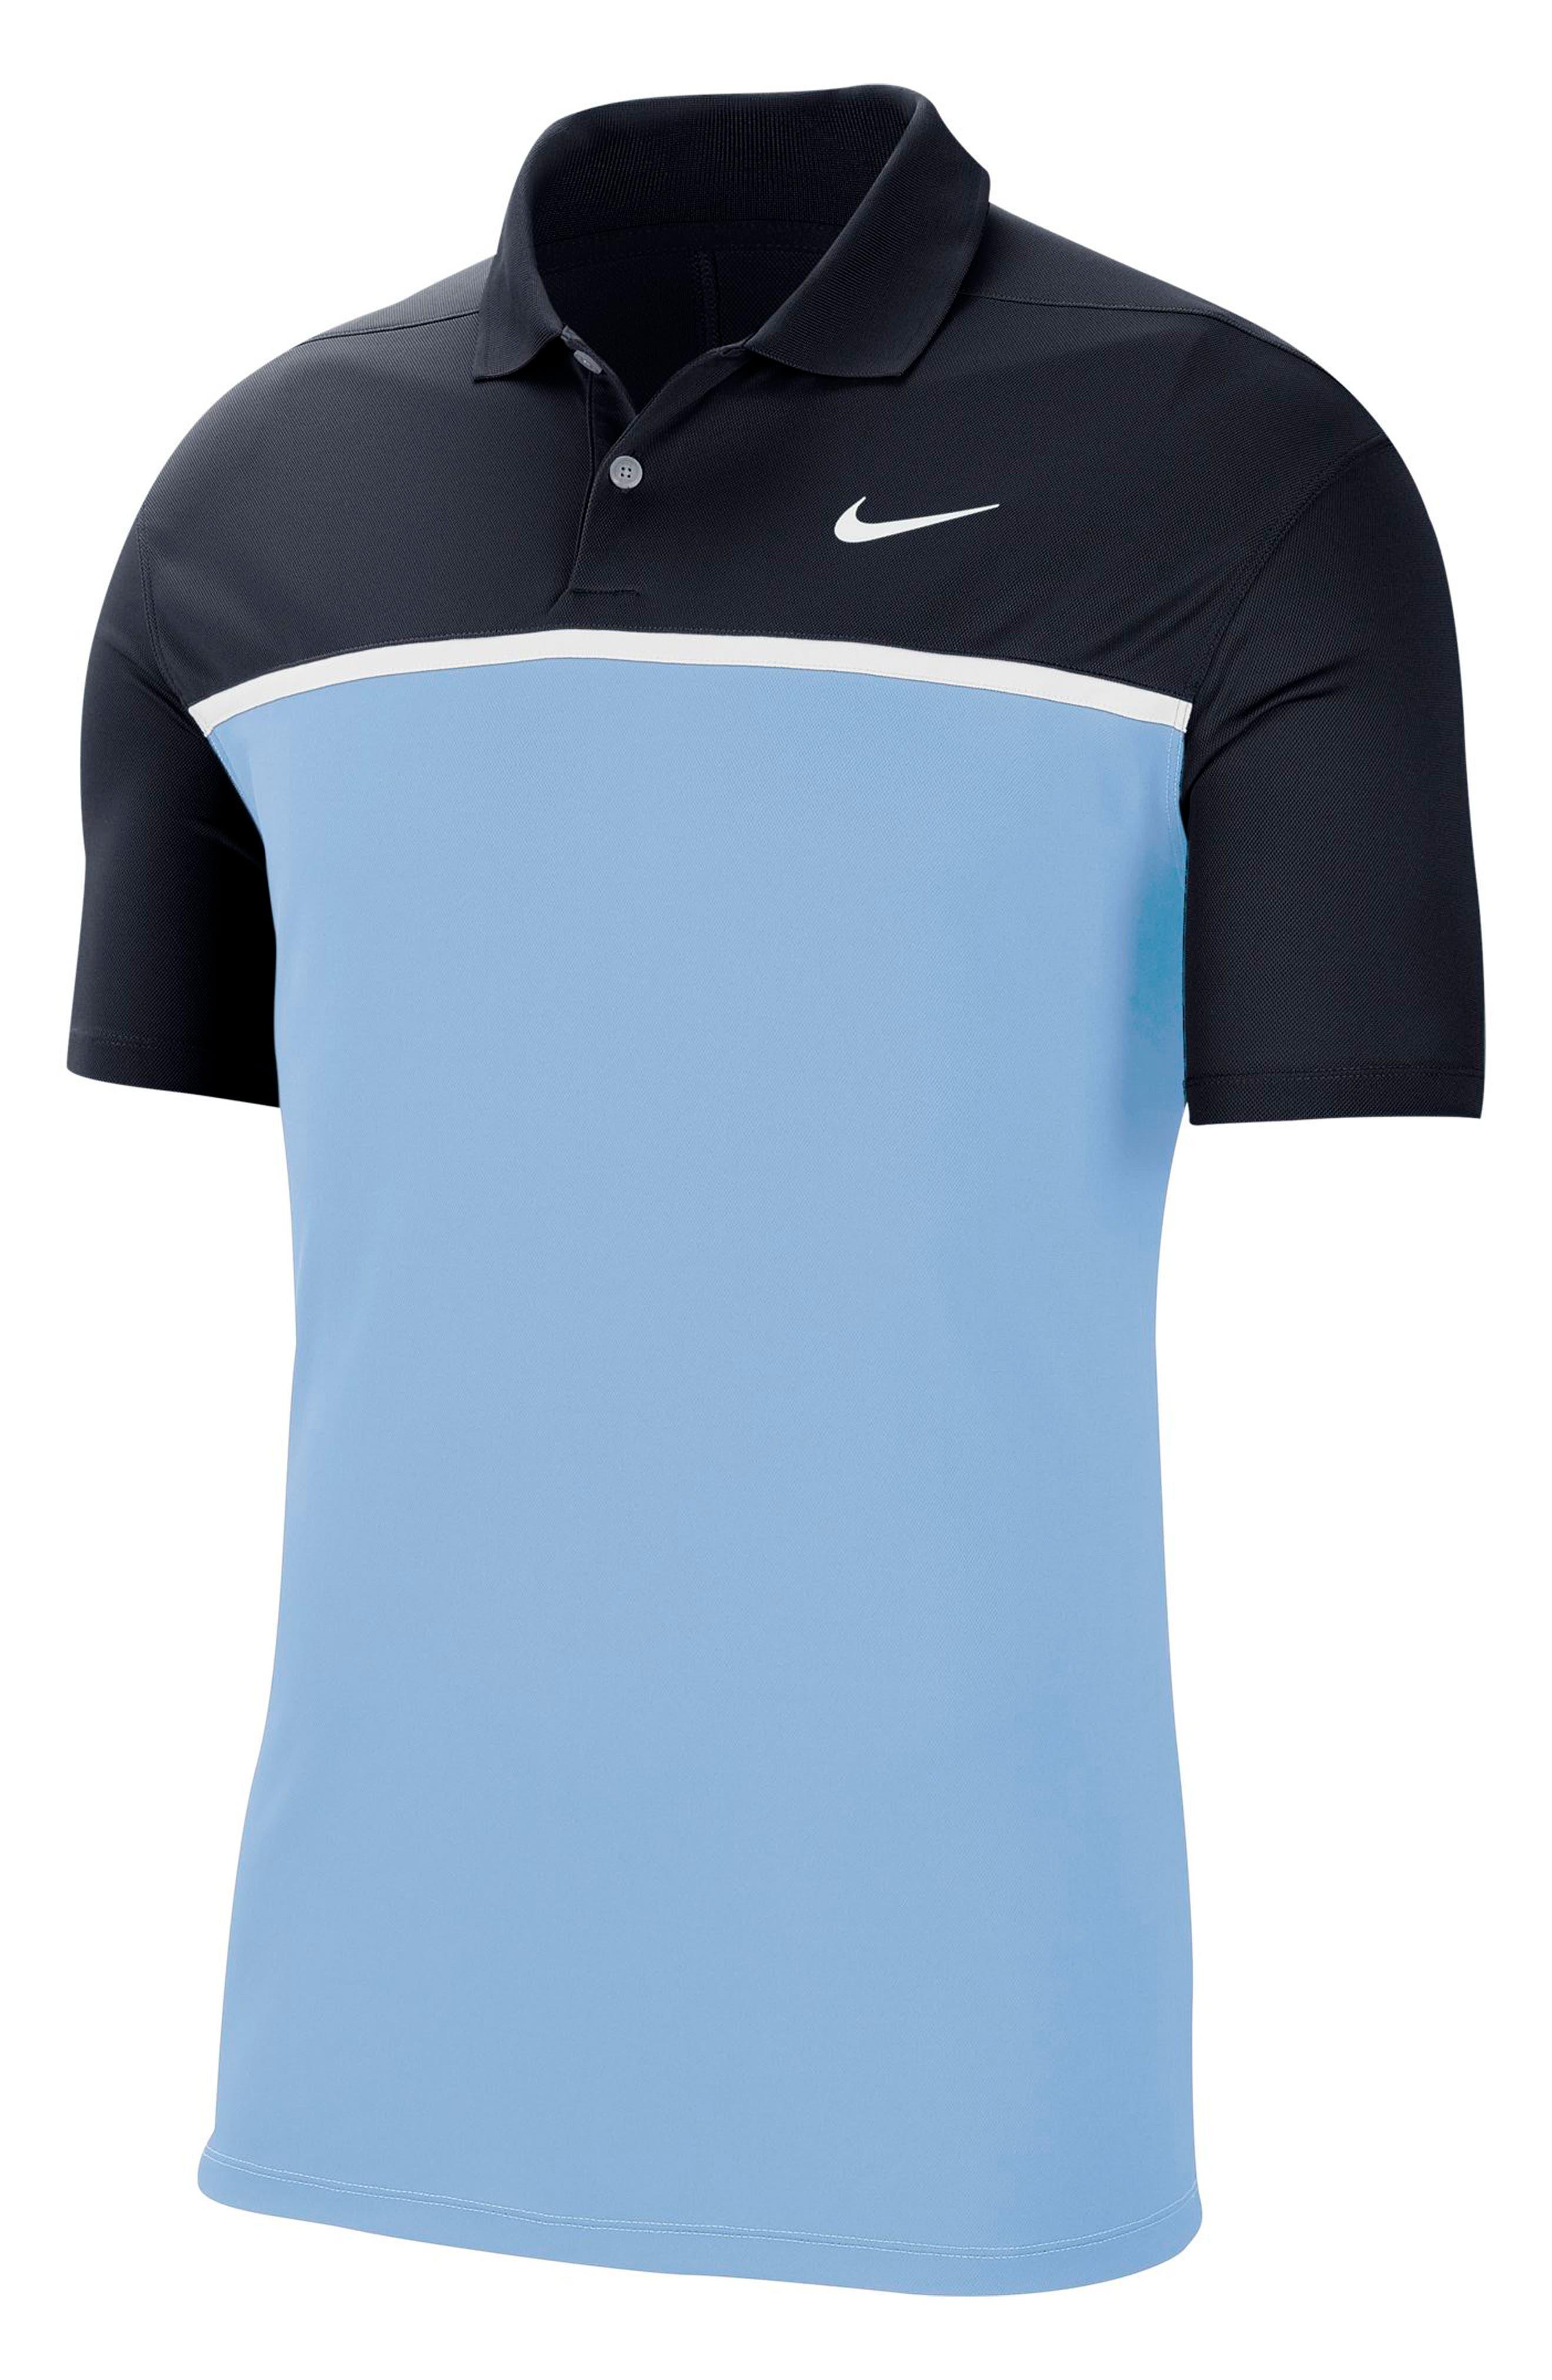 Nike Men's Cotton Polo (Black)